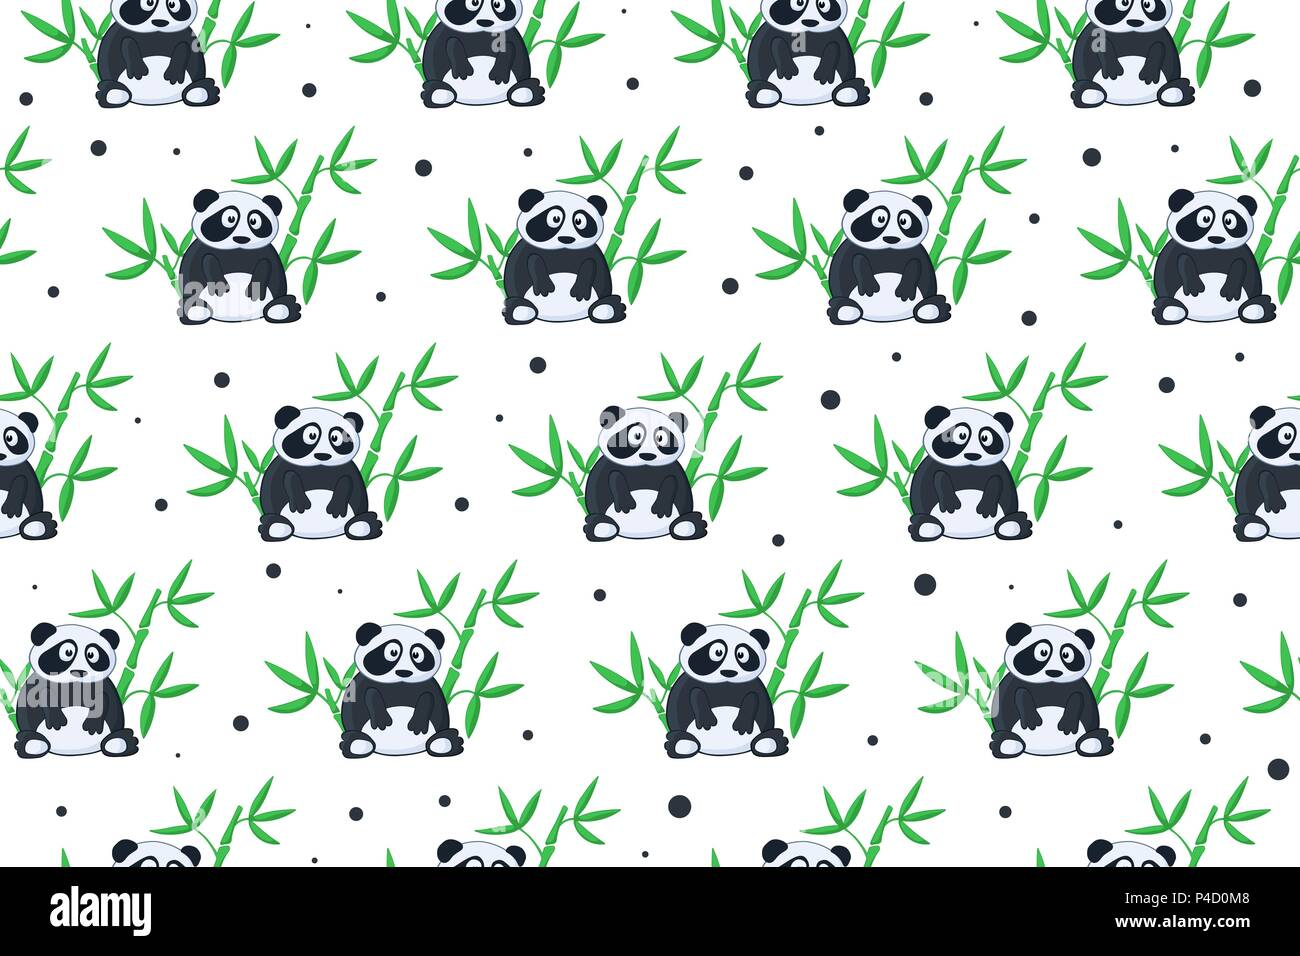 cartoon animals pattern - Stock Image